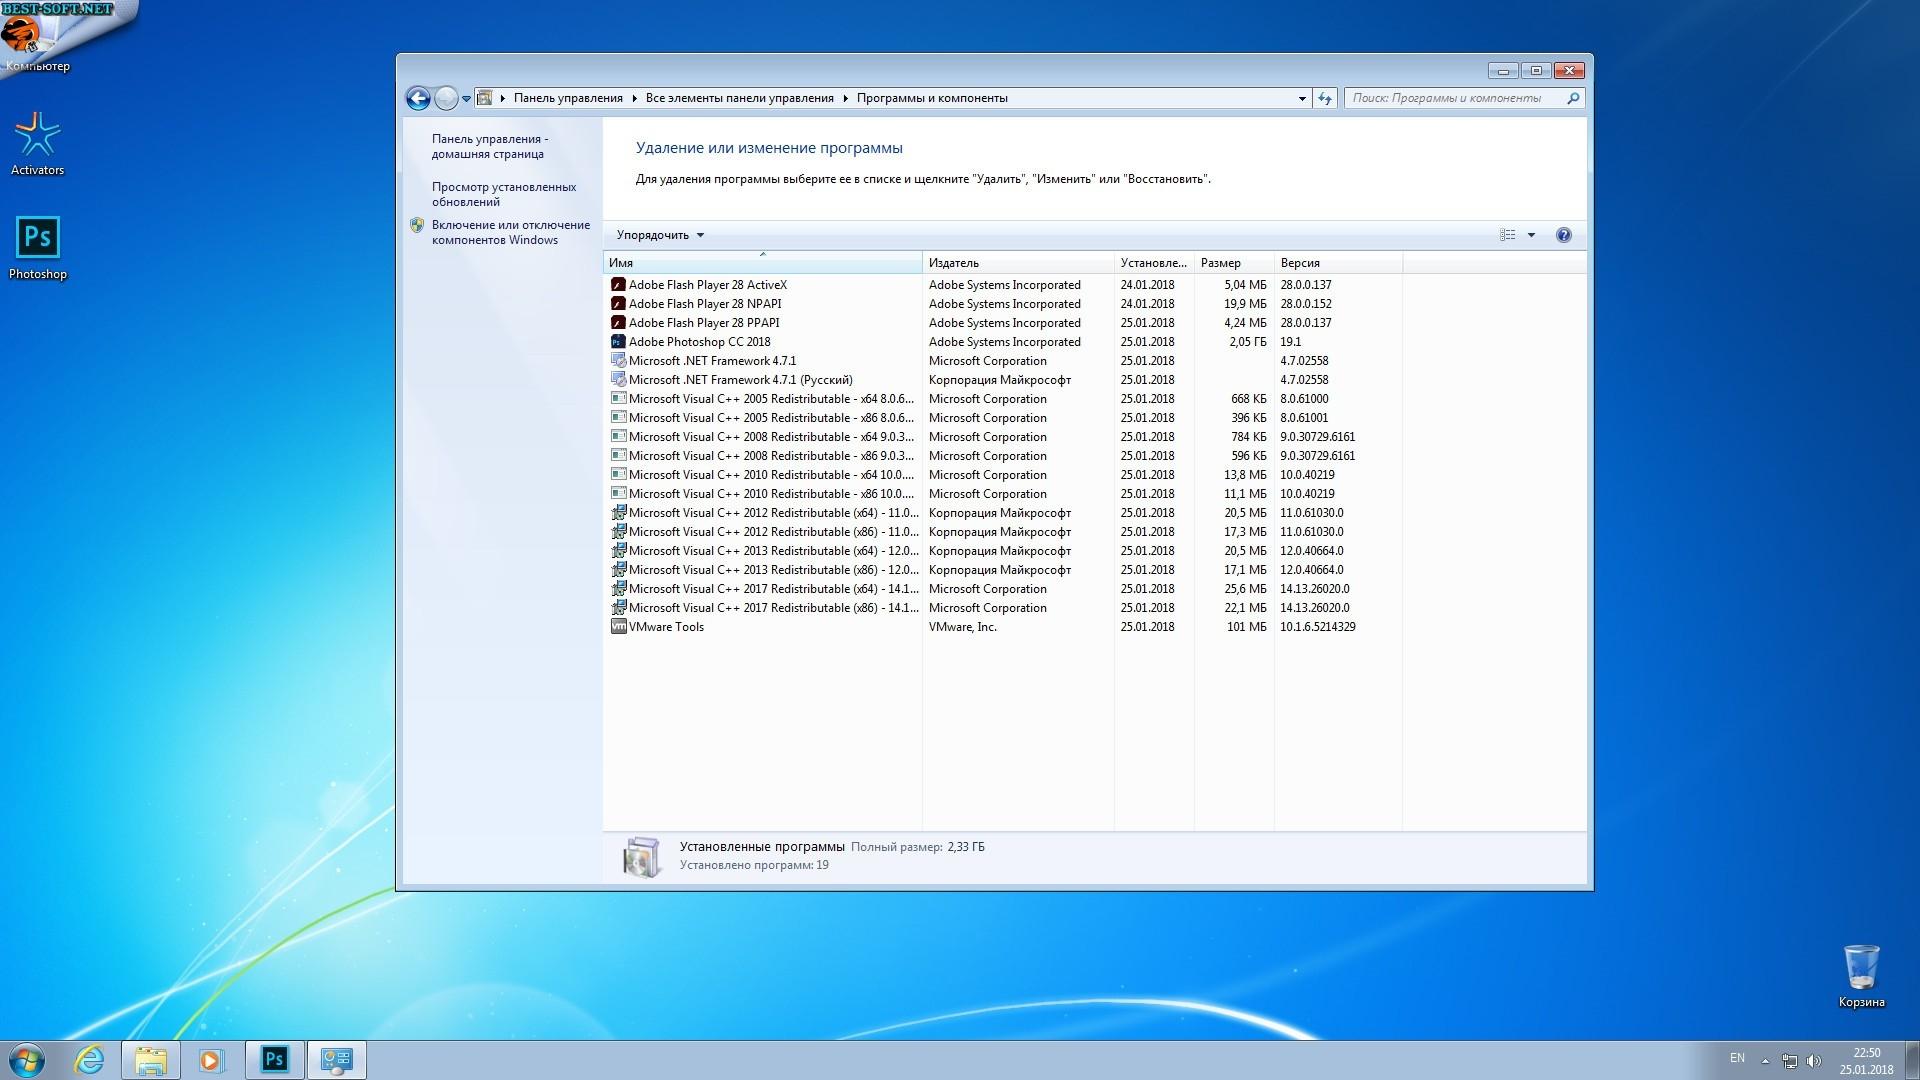 Windows 7 Features